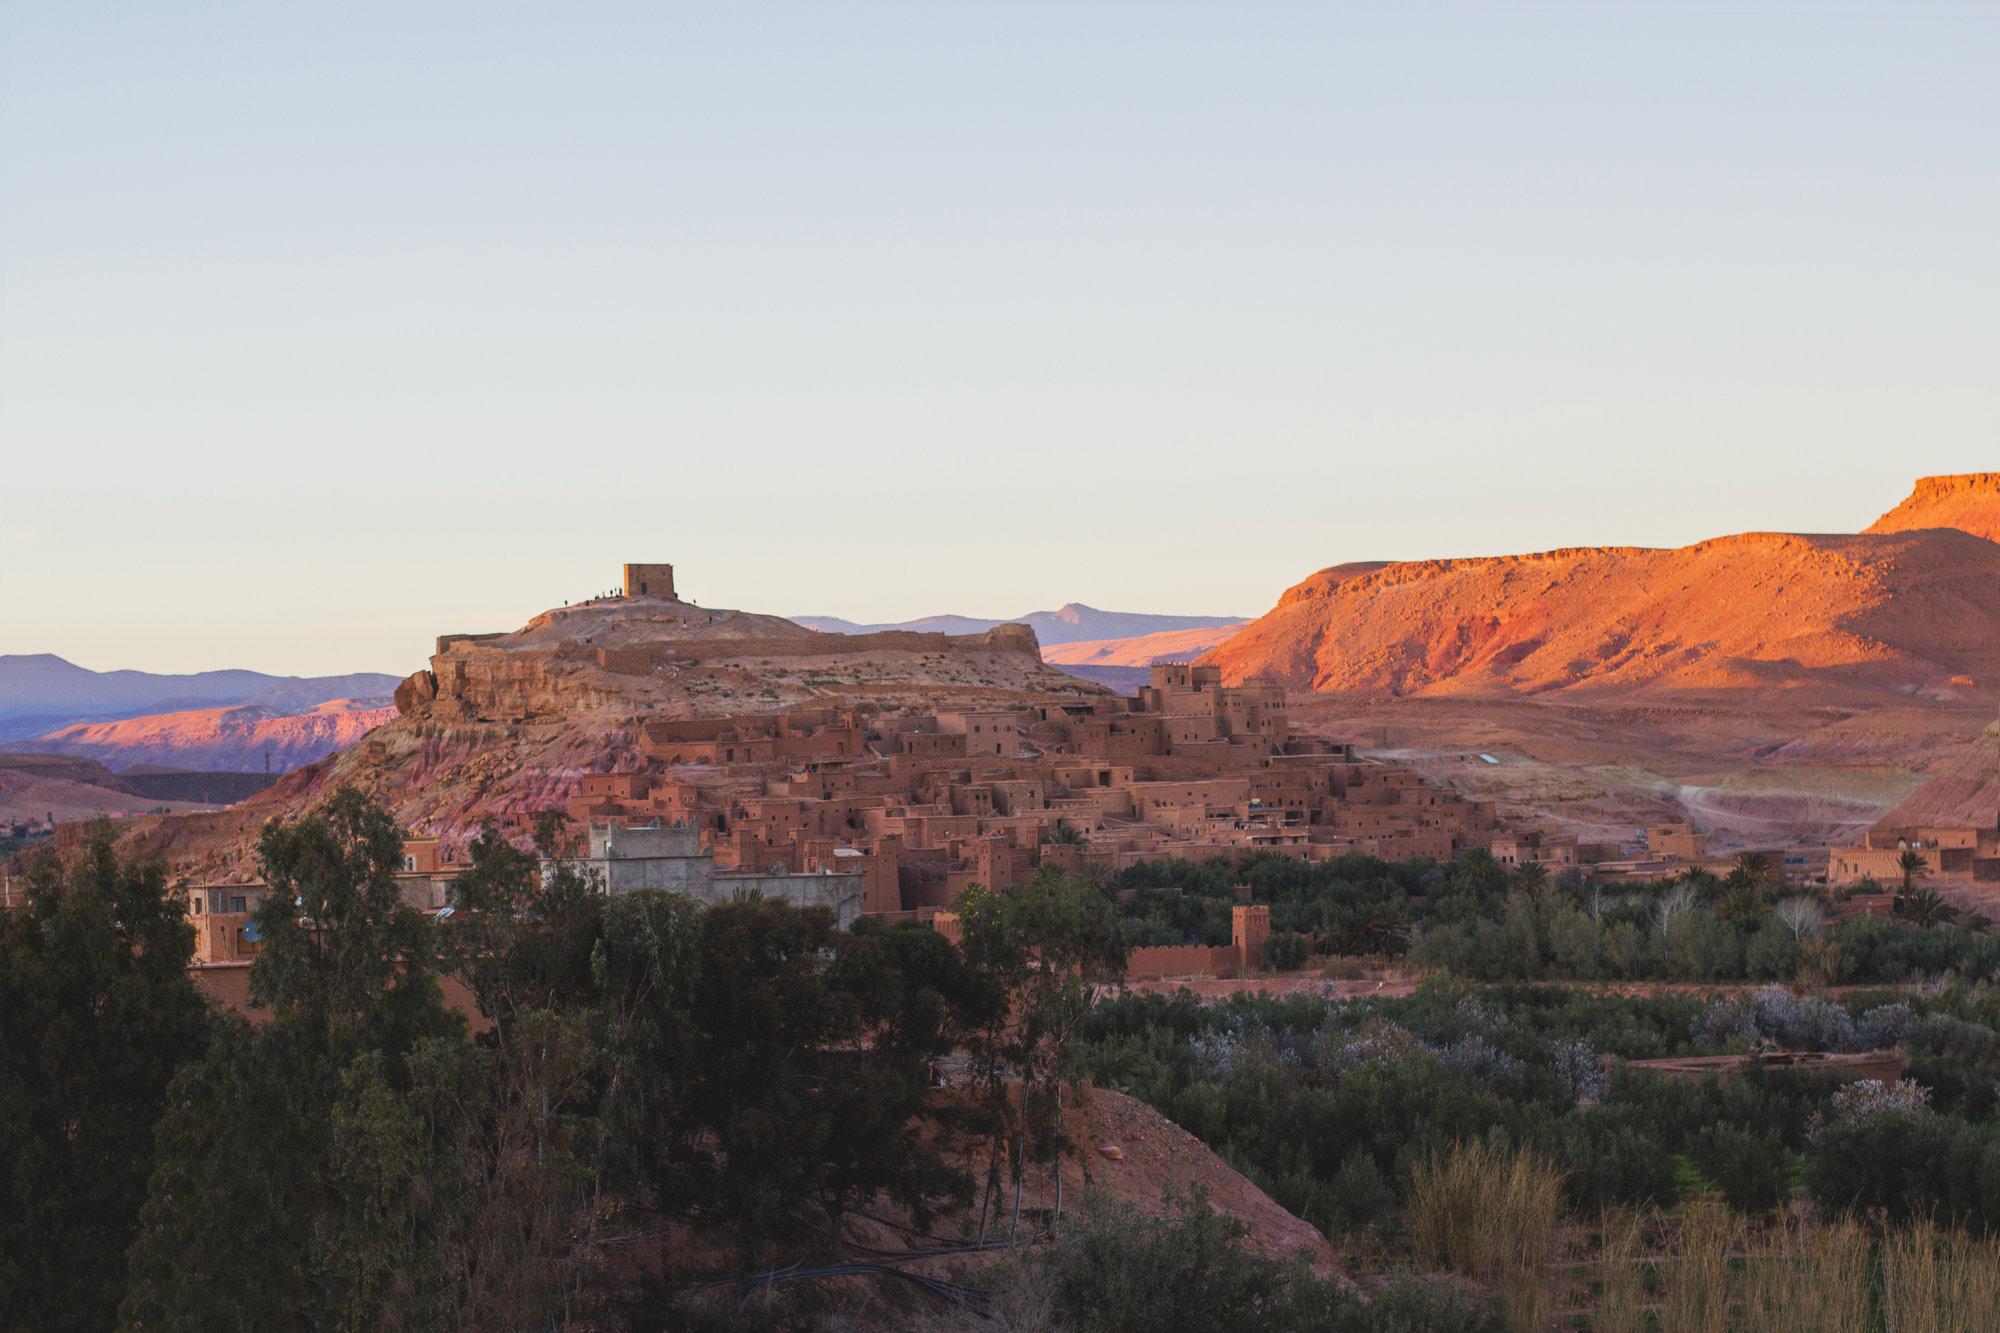 skalnaté hory datovania